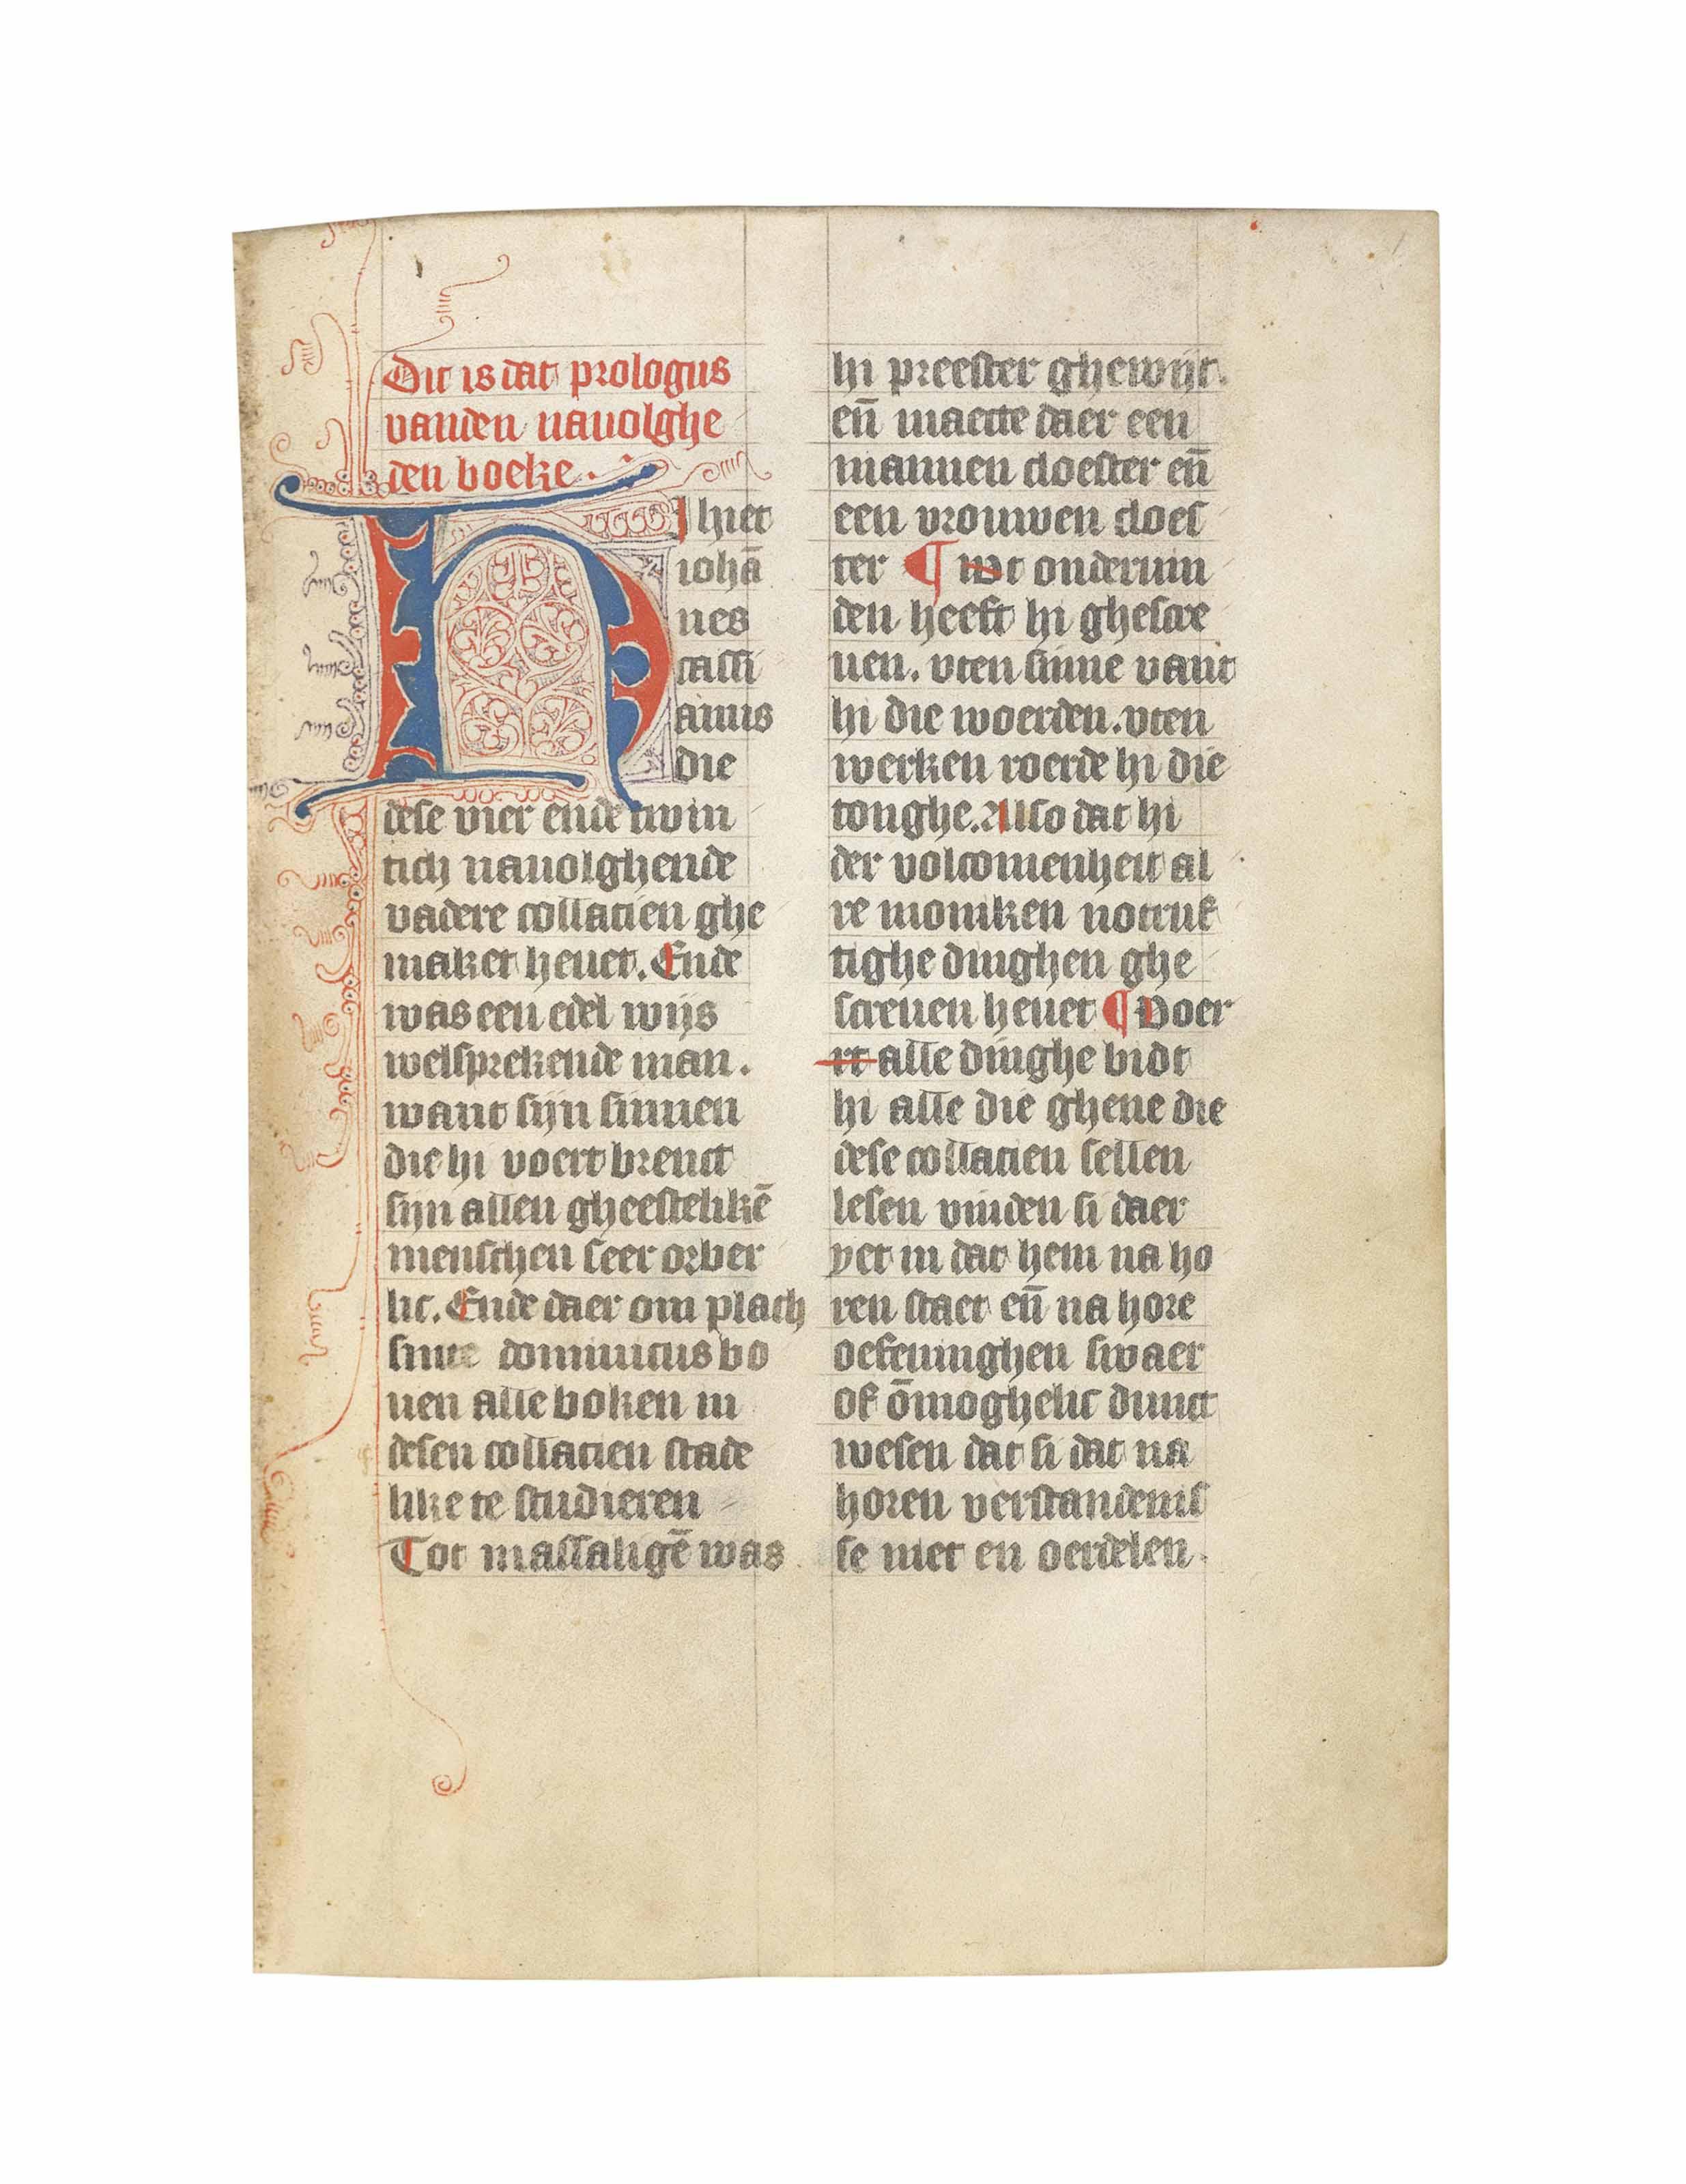 JOHANNES CASSIANUS (d. c.435),